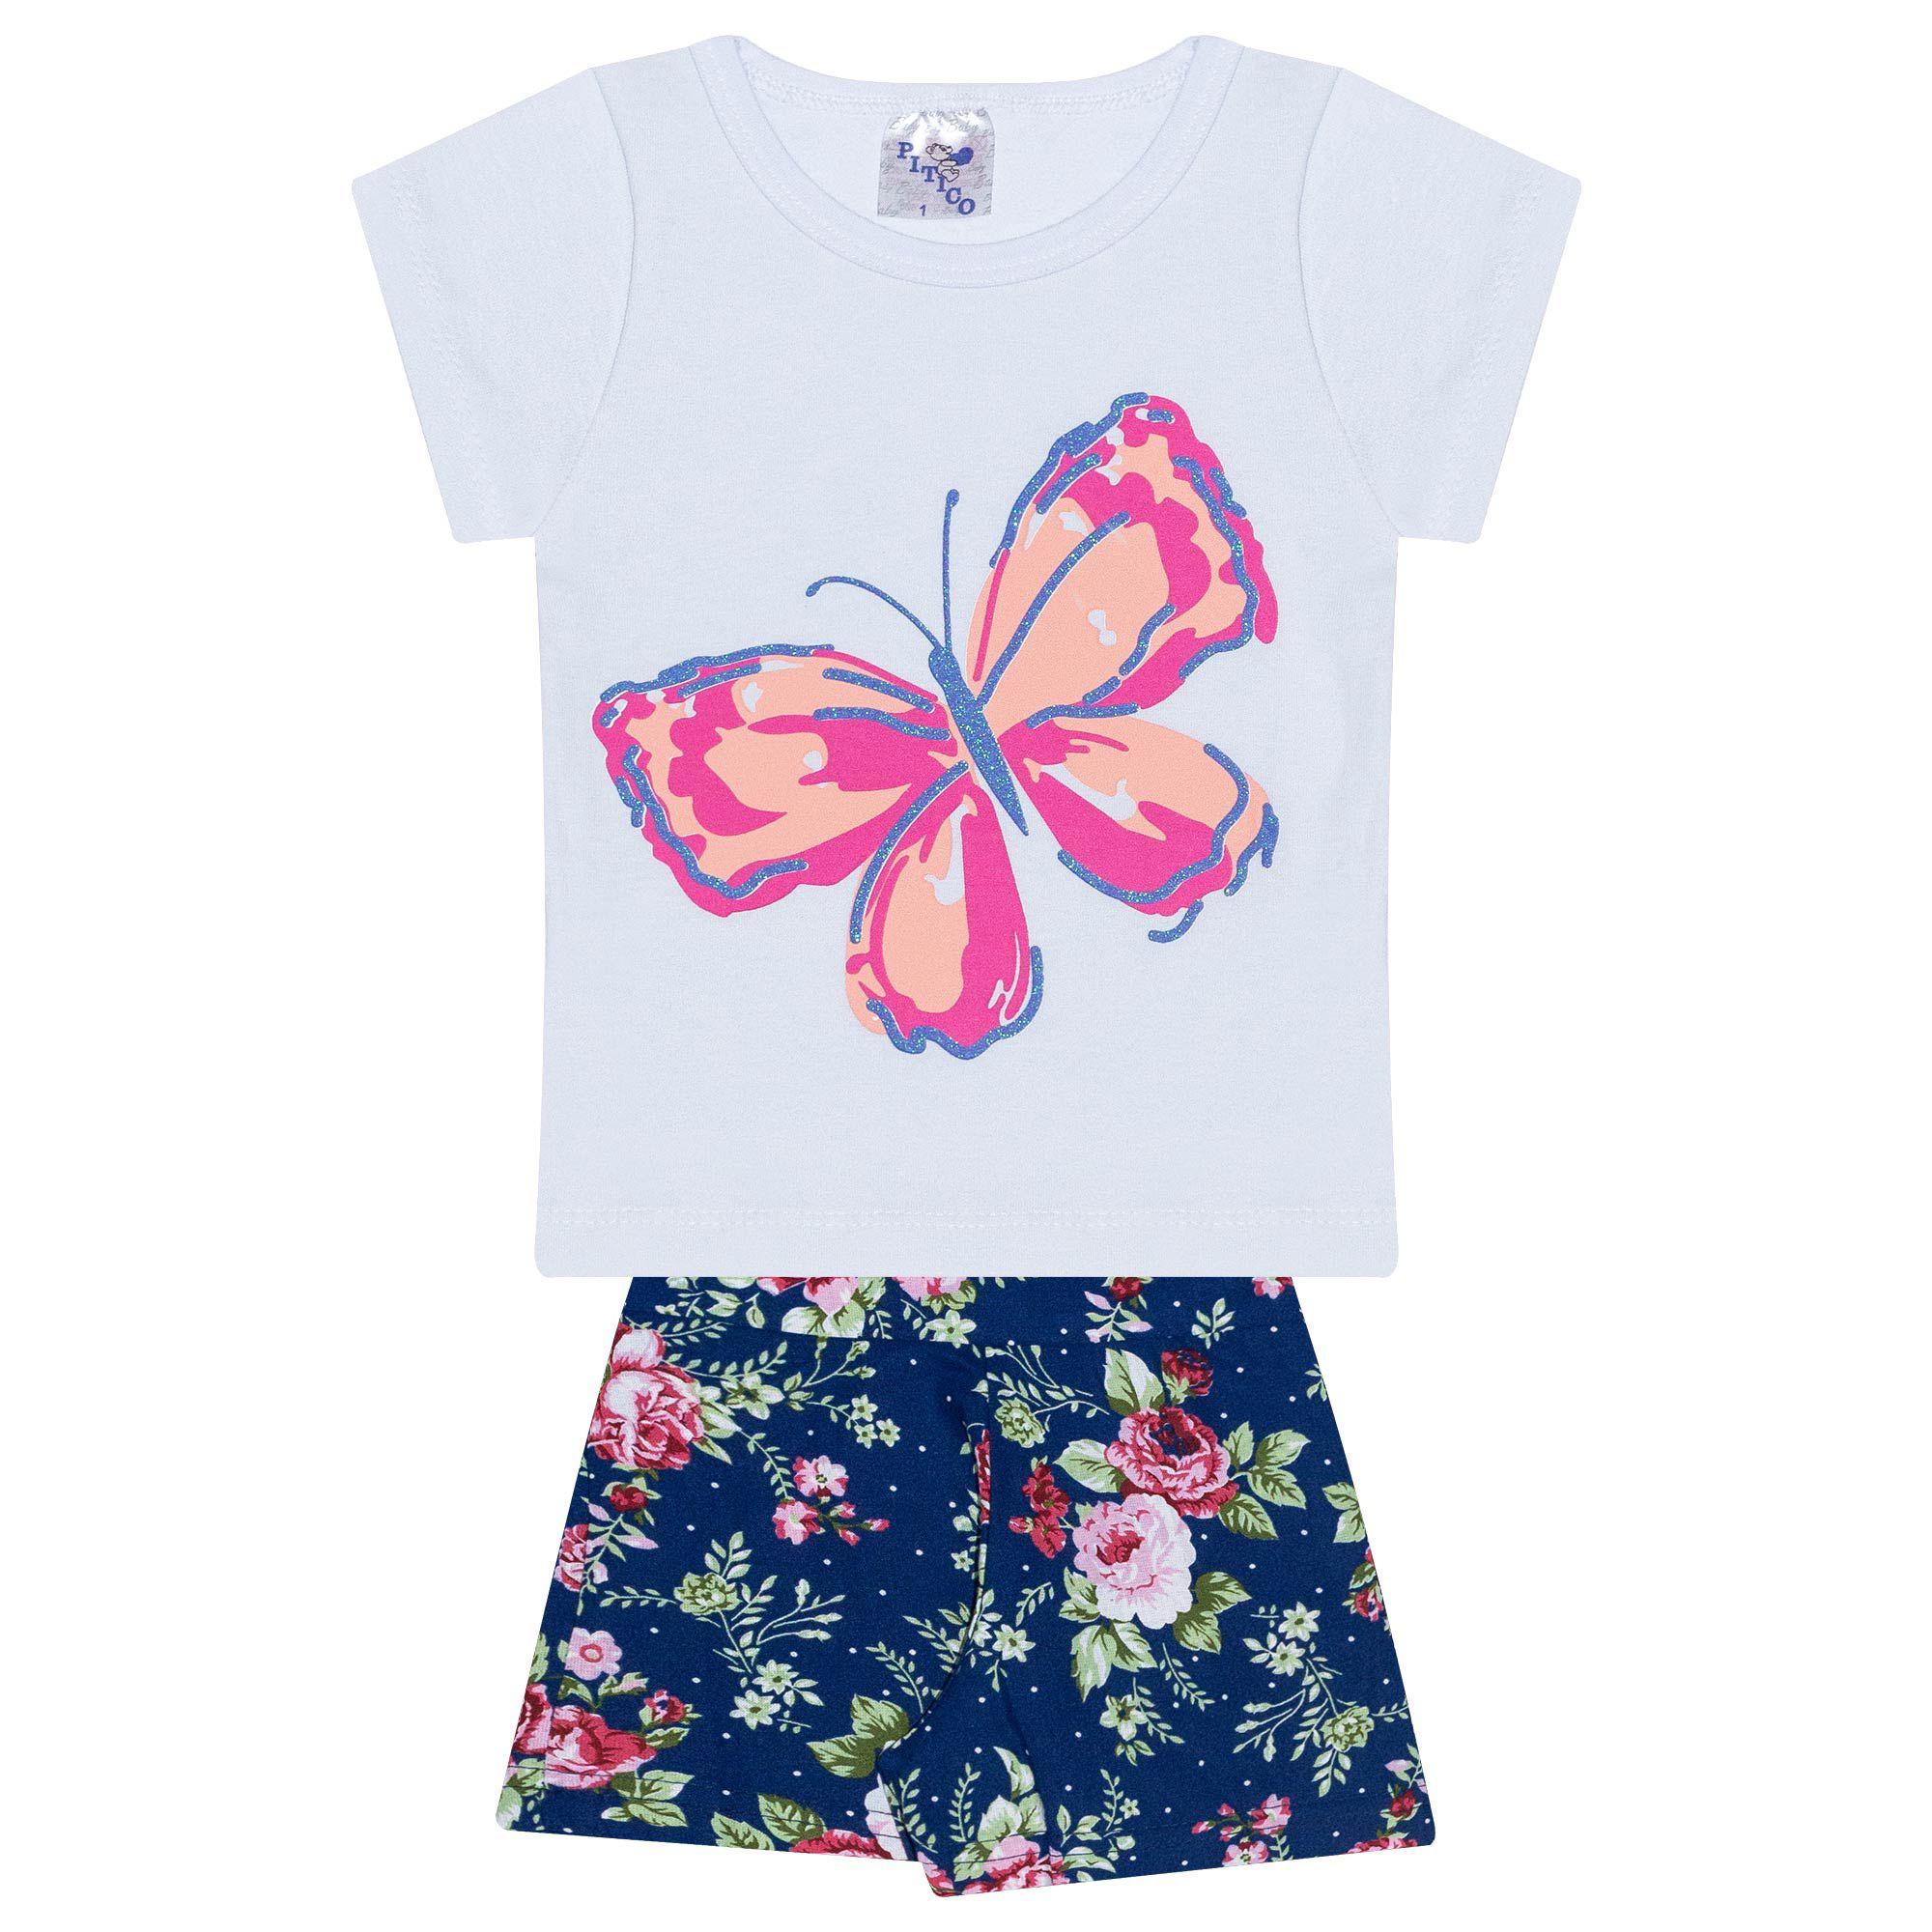 Conjunto Infantil Feminino - Ref 1014 - Branco/Azul - Pitico